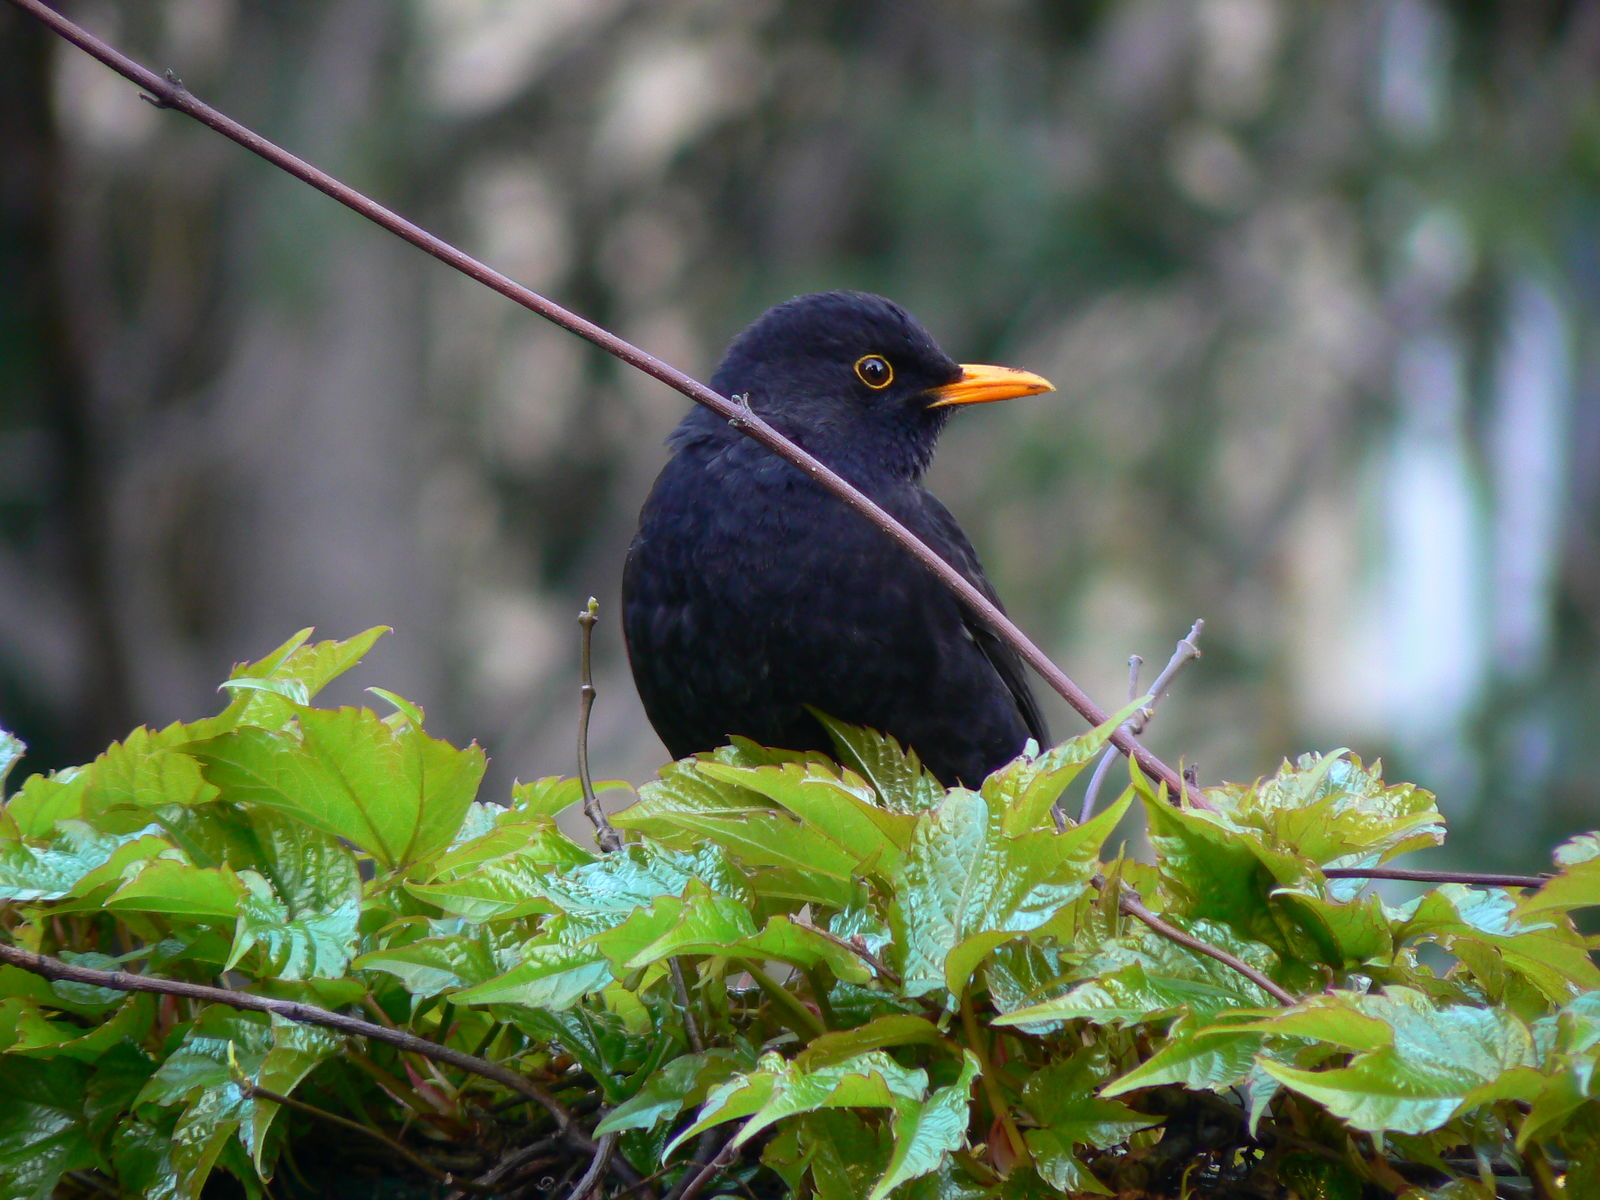 Casciana Terme Lari - The elegance of the blackbird - Tuscany, Beautiful Everywhere